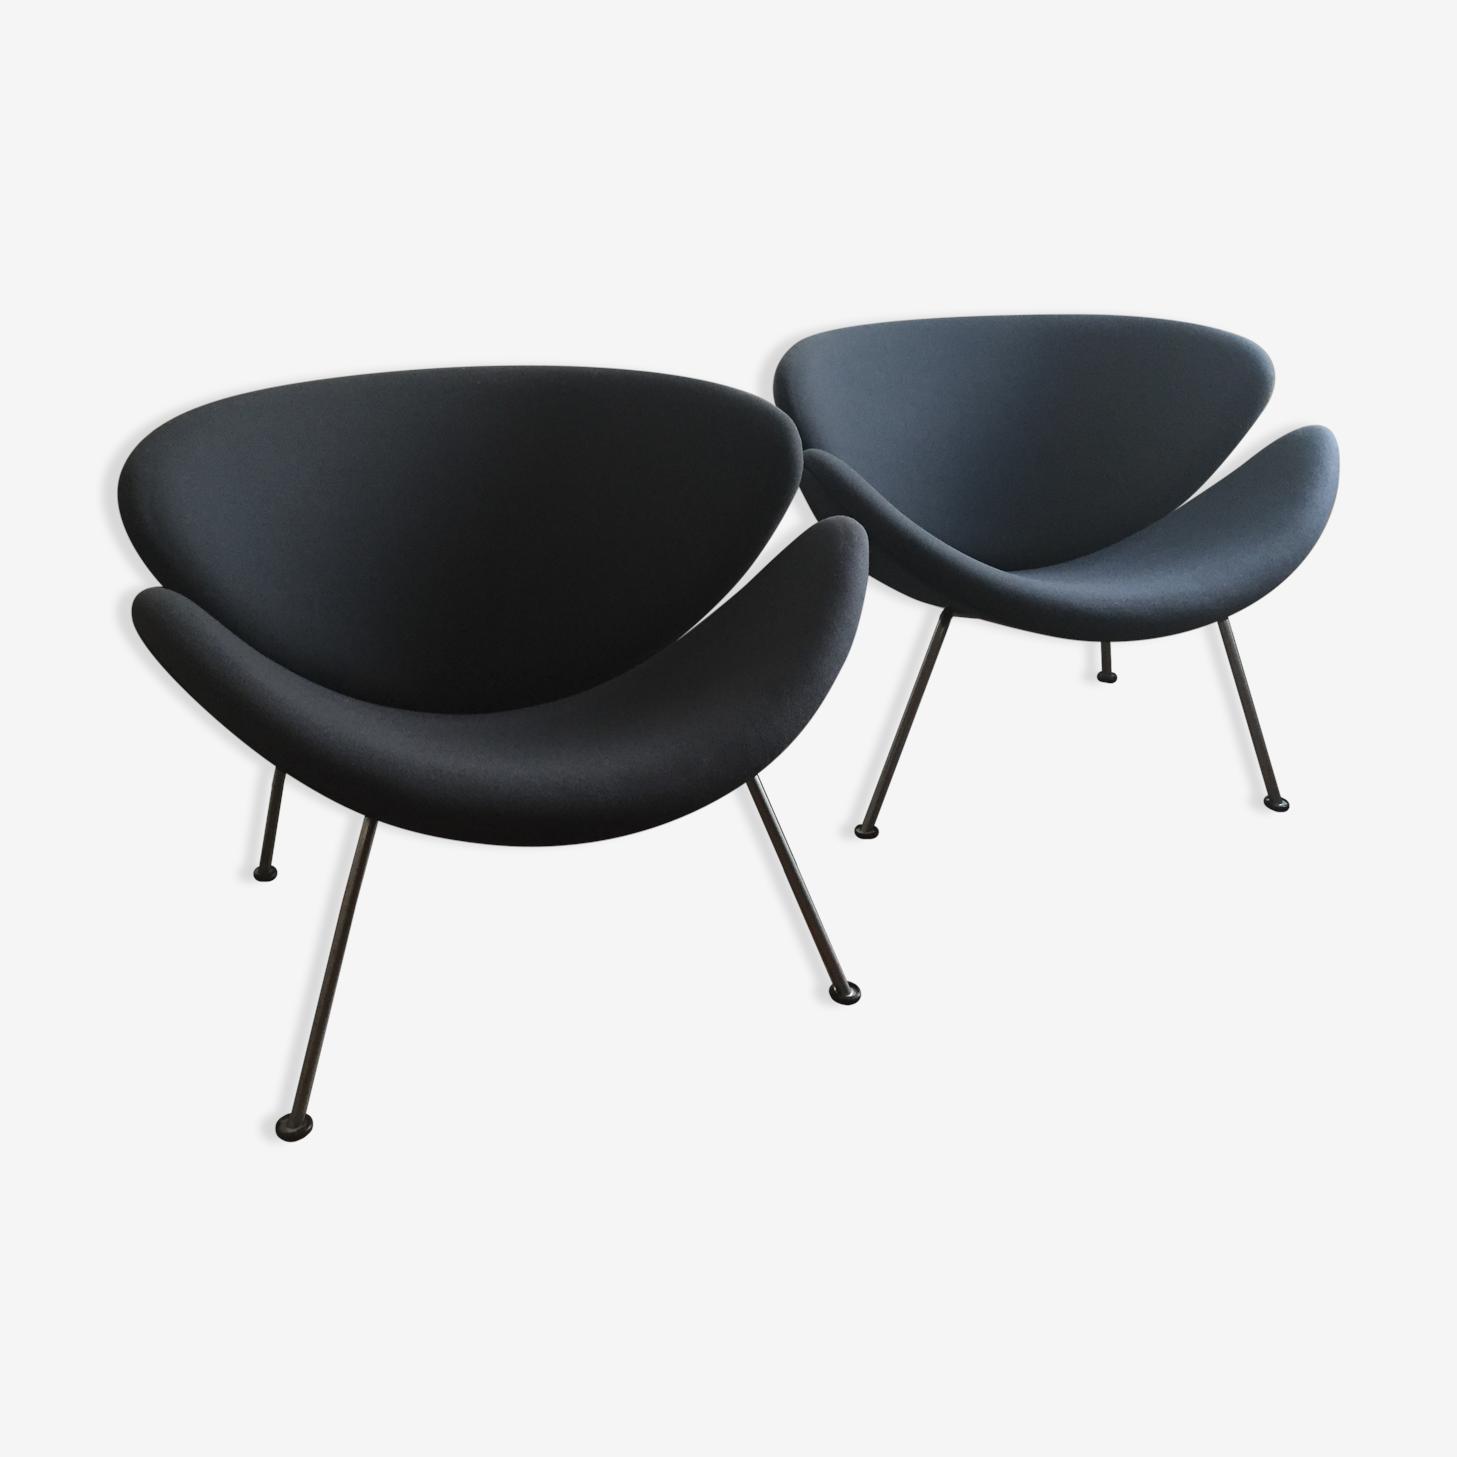 Orange slice F437 armchairs by Pierre Paulin for Artifort